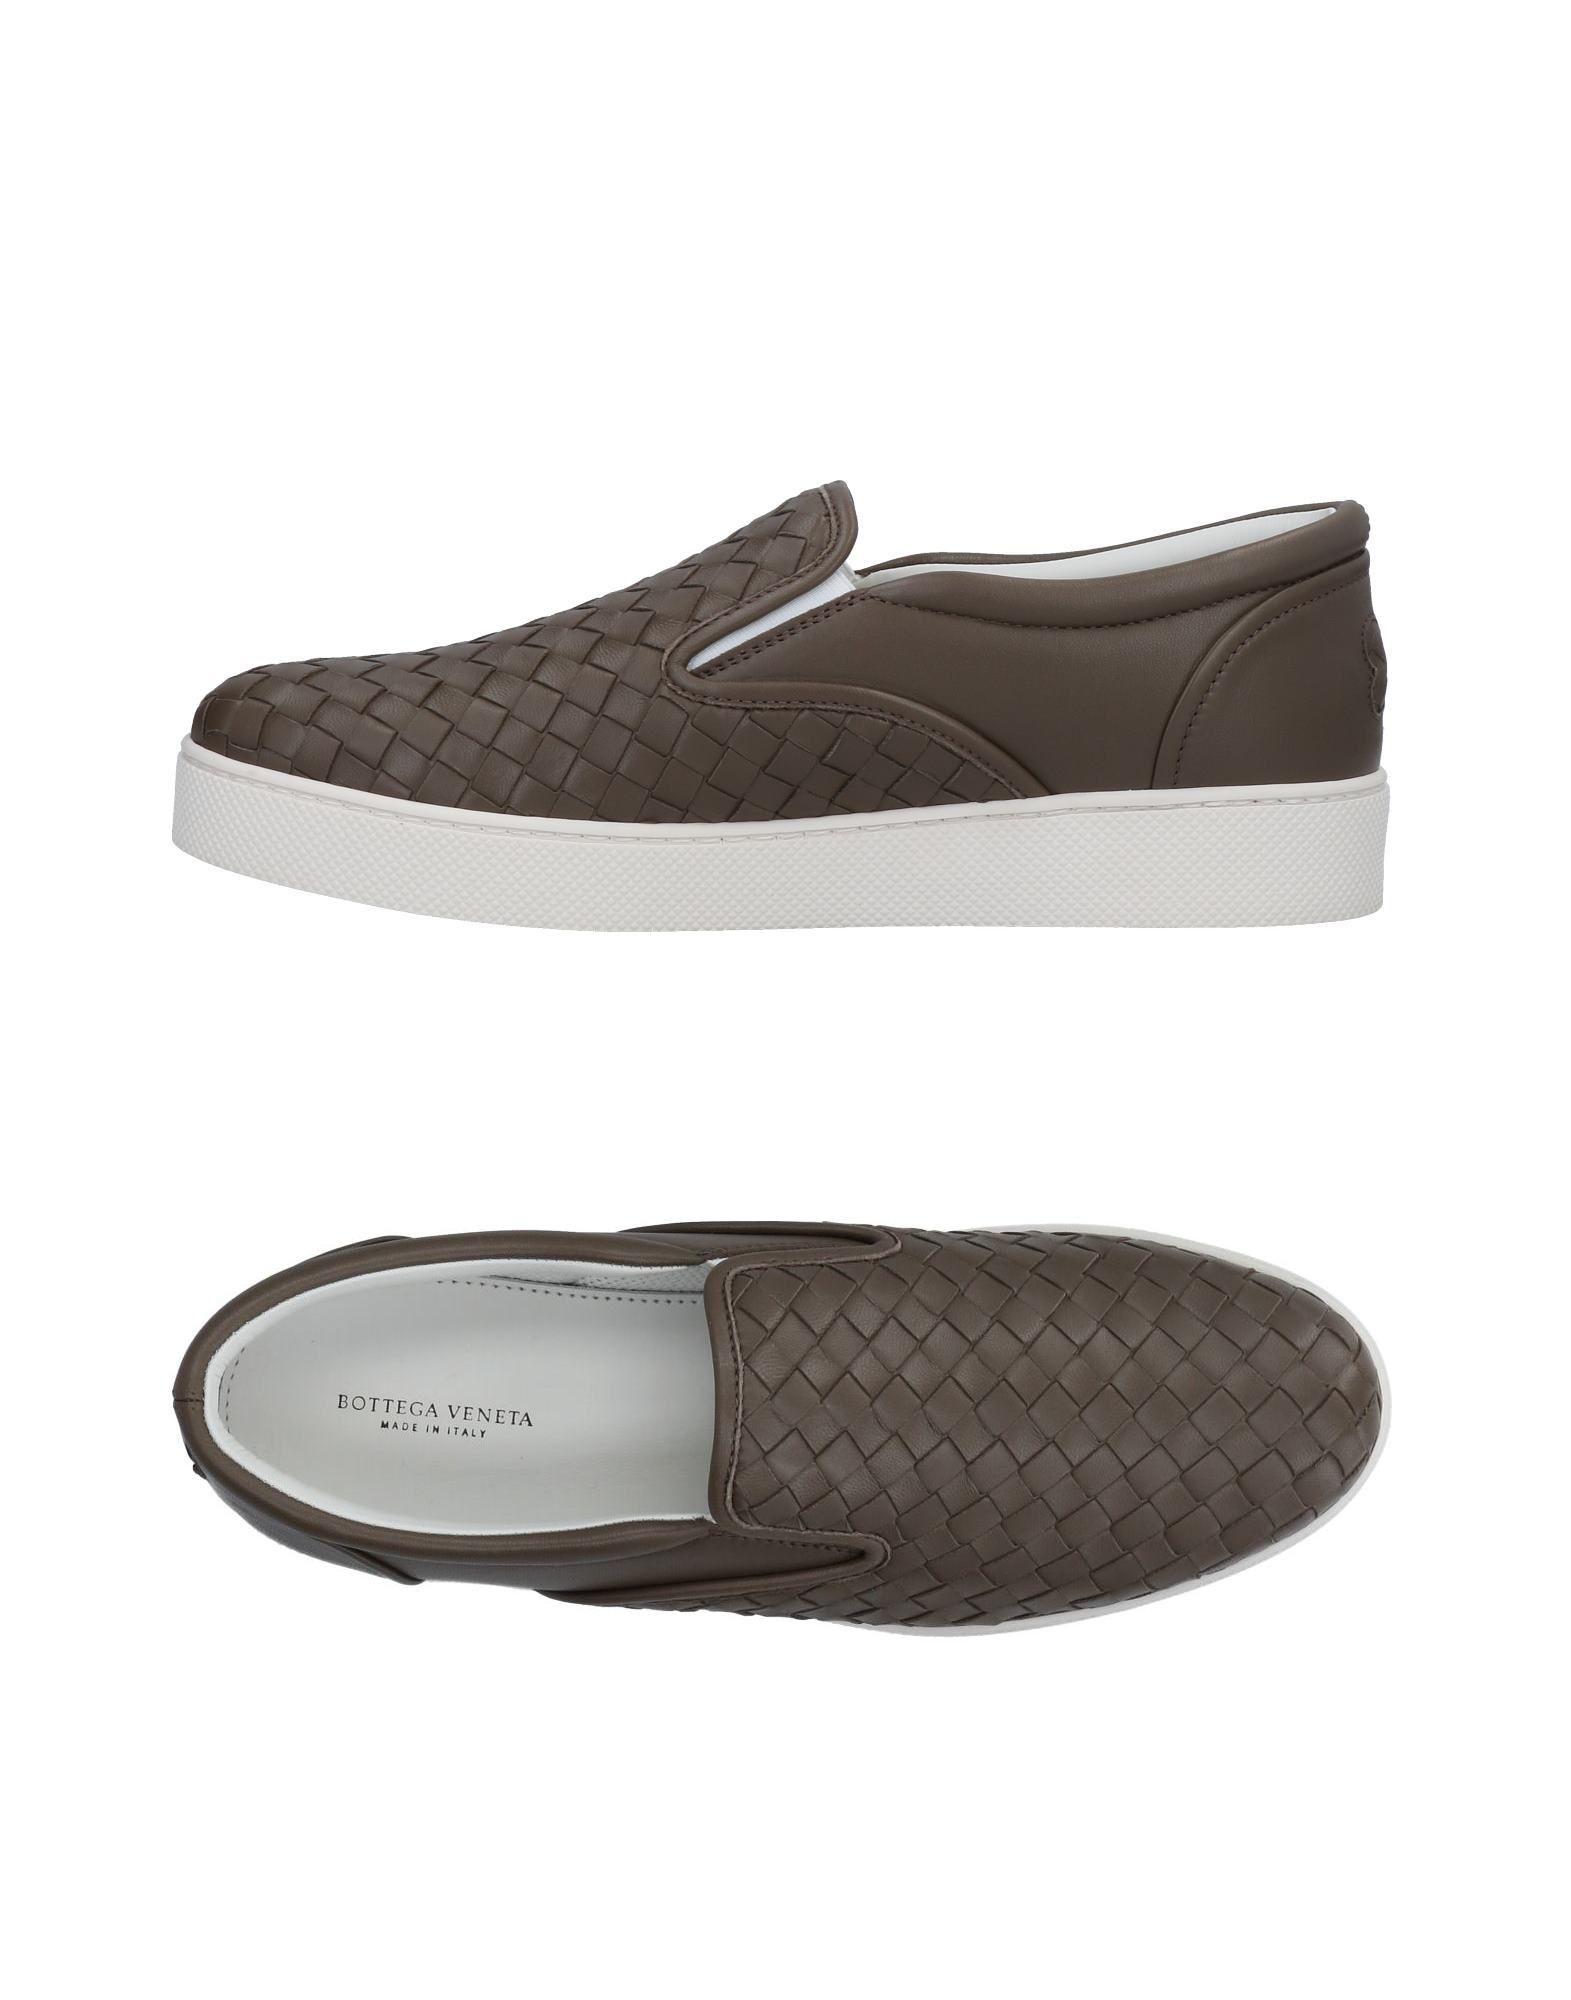 Sneakers Bottega Veneta Donna - Acquista online su